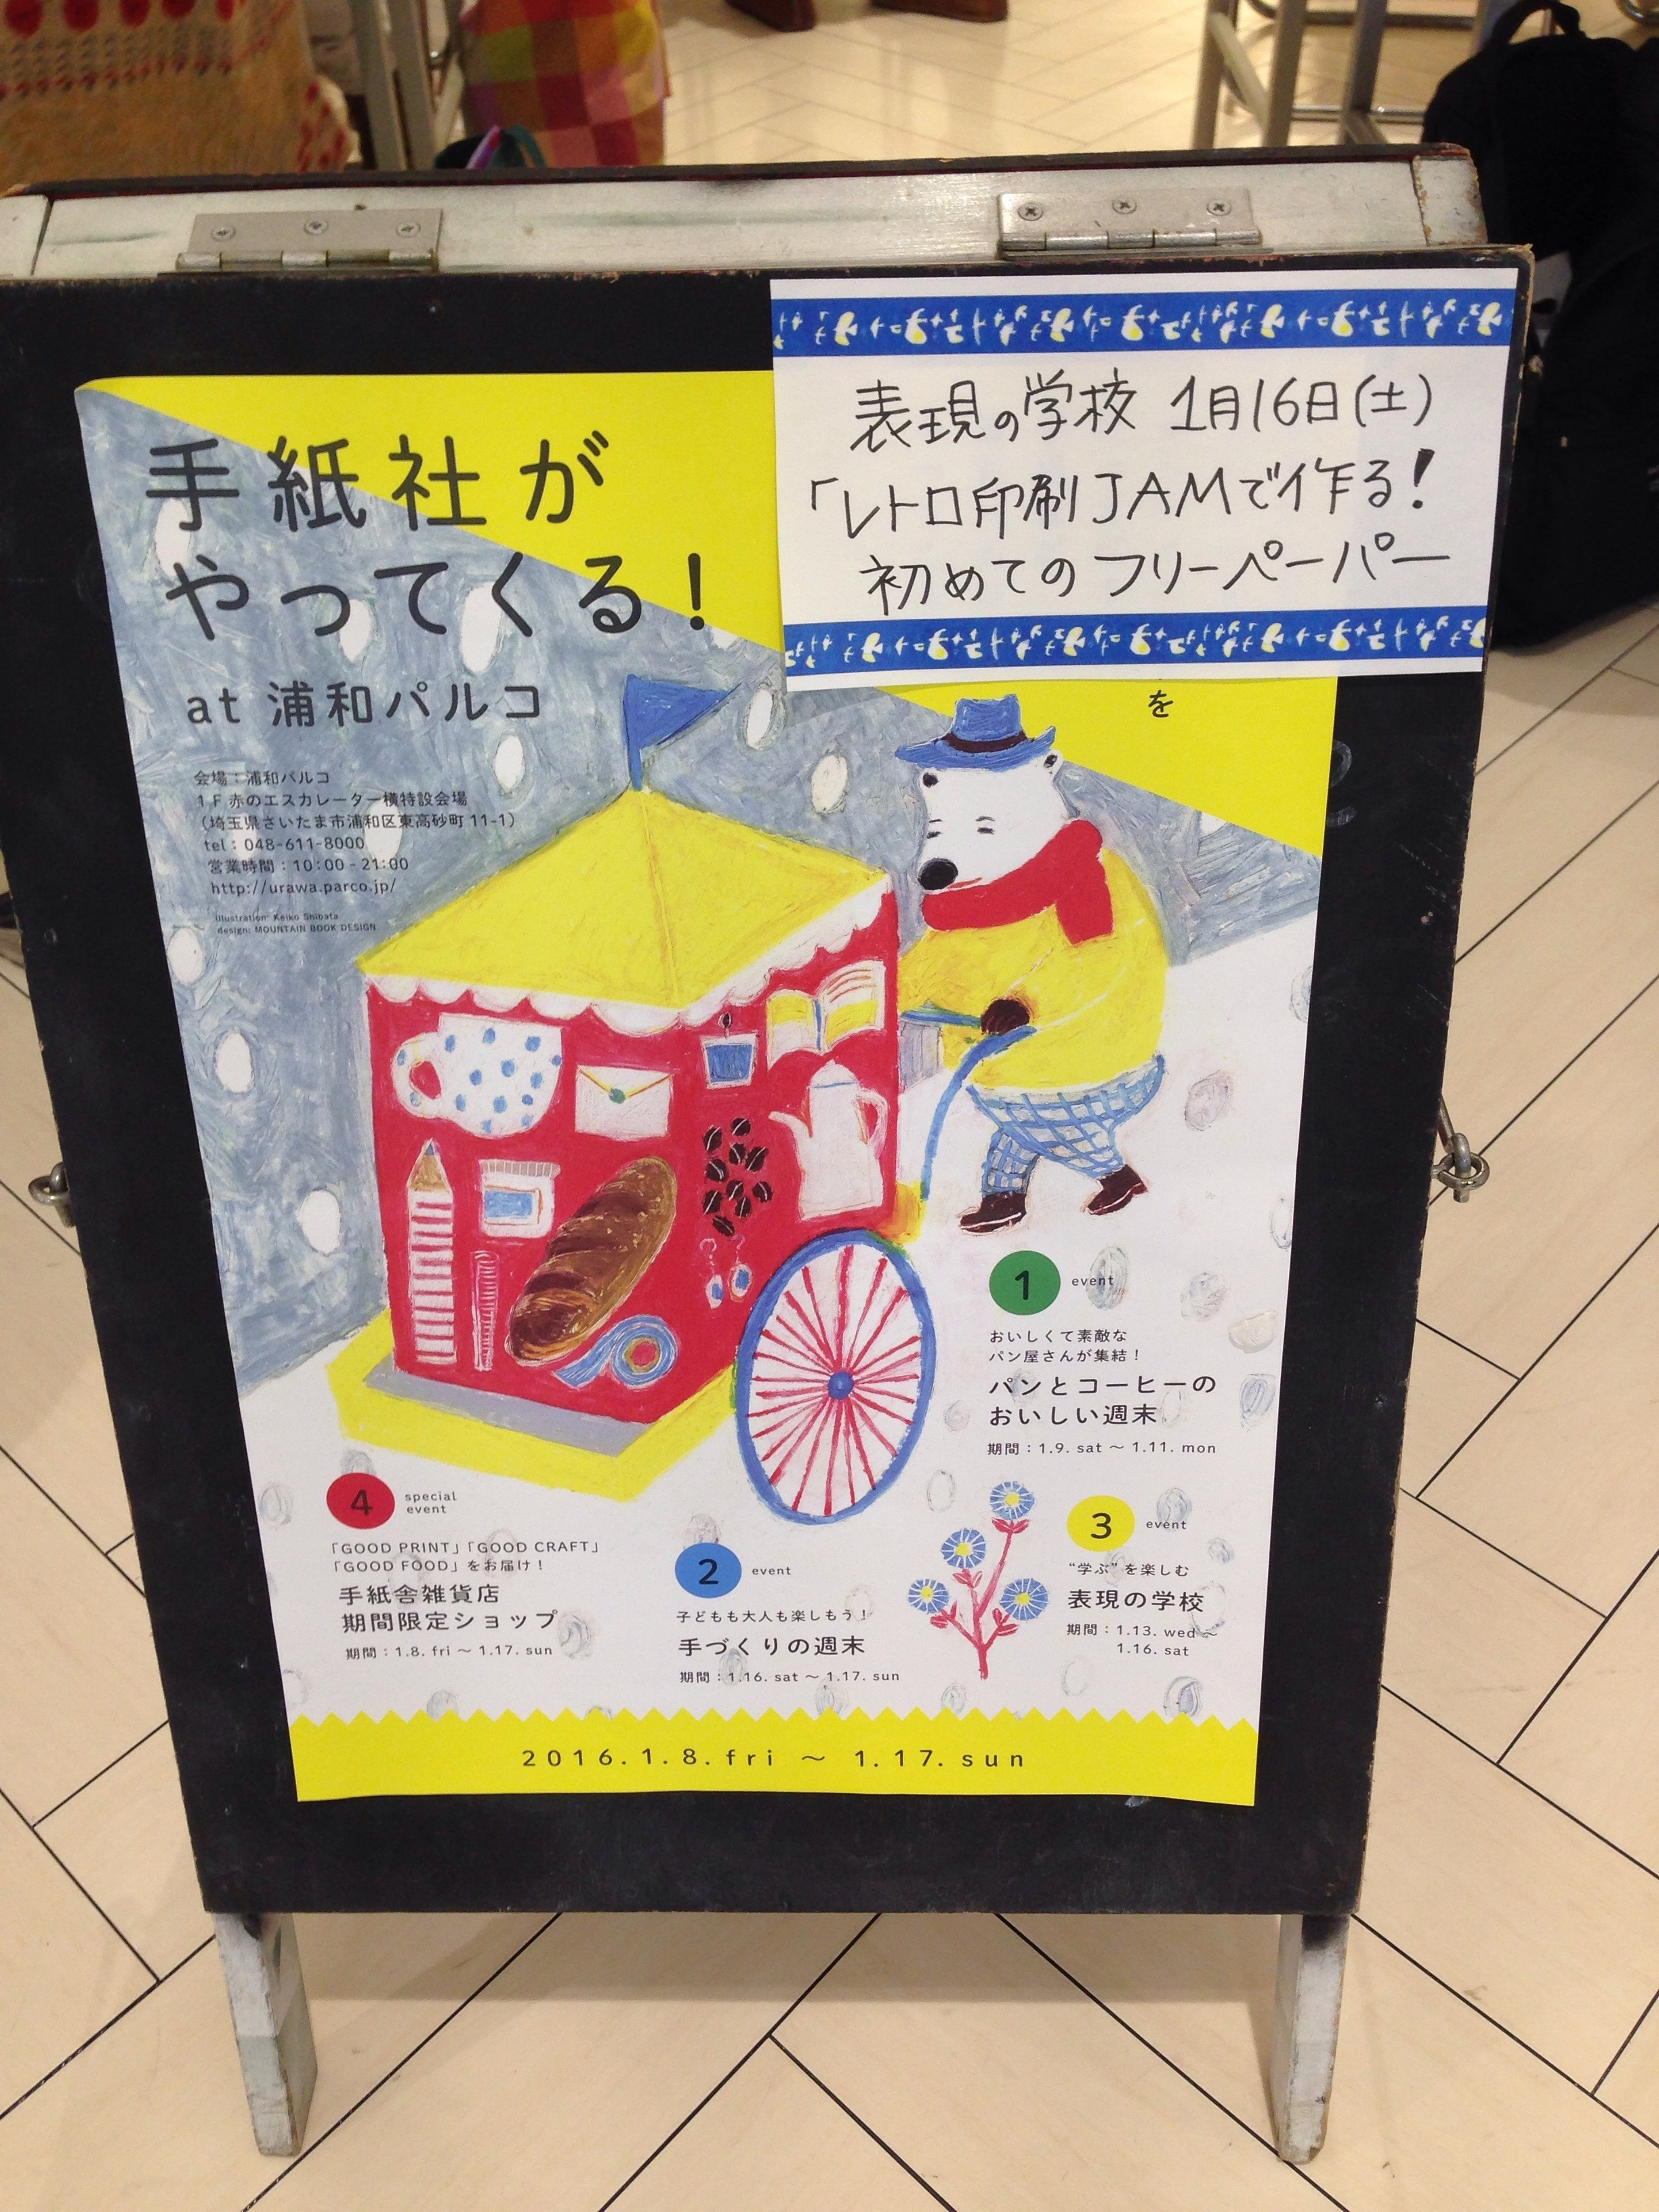 Risographic Printing Workshop by Tegamisha